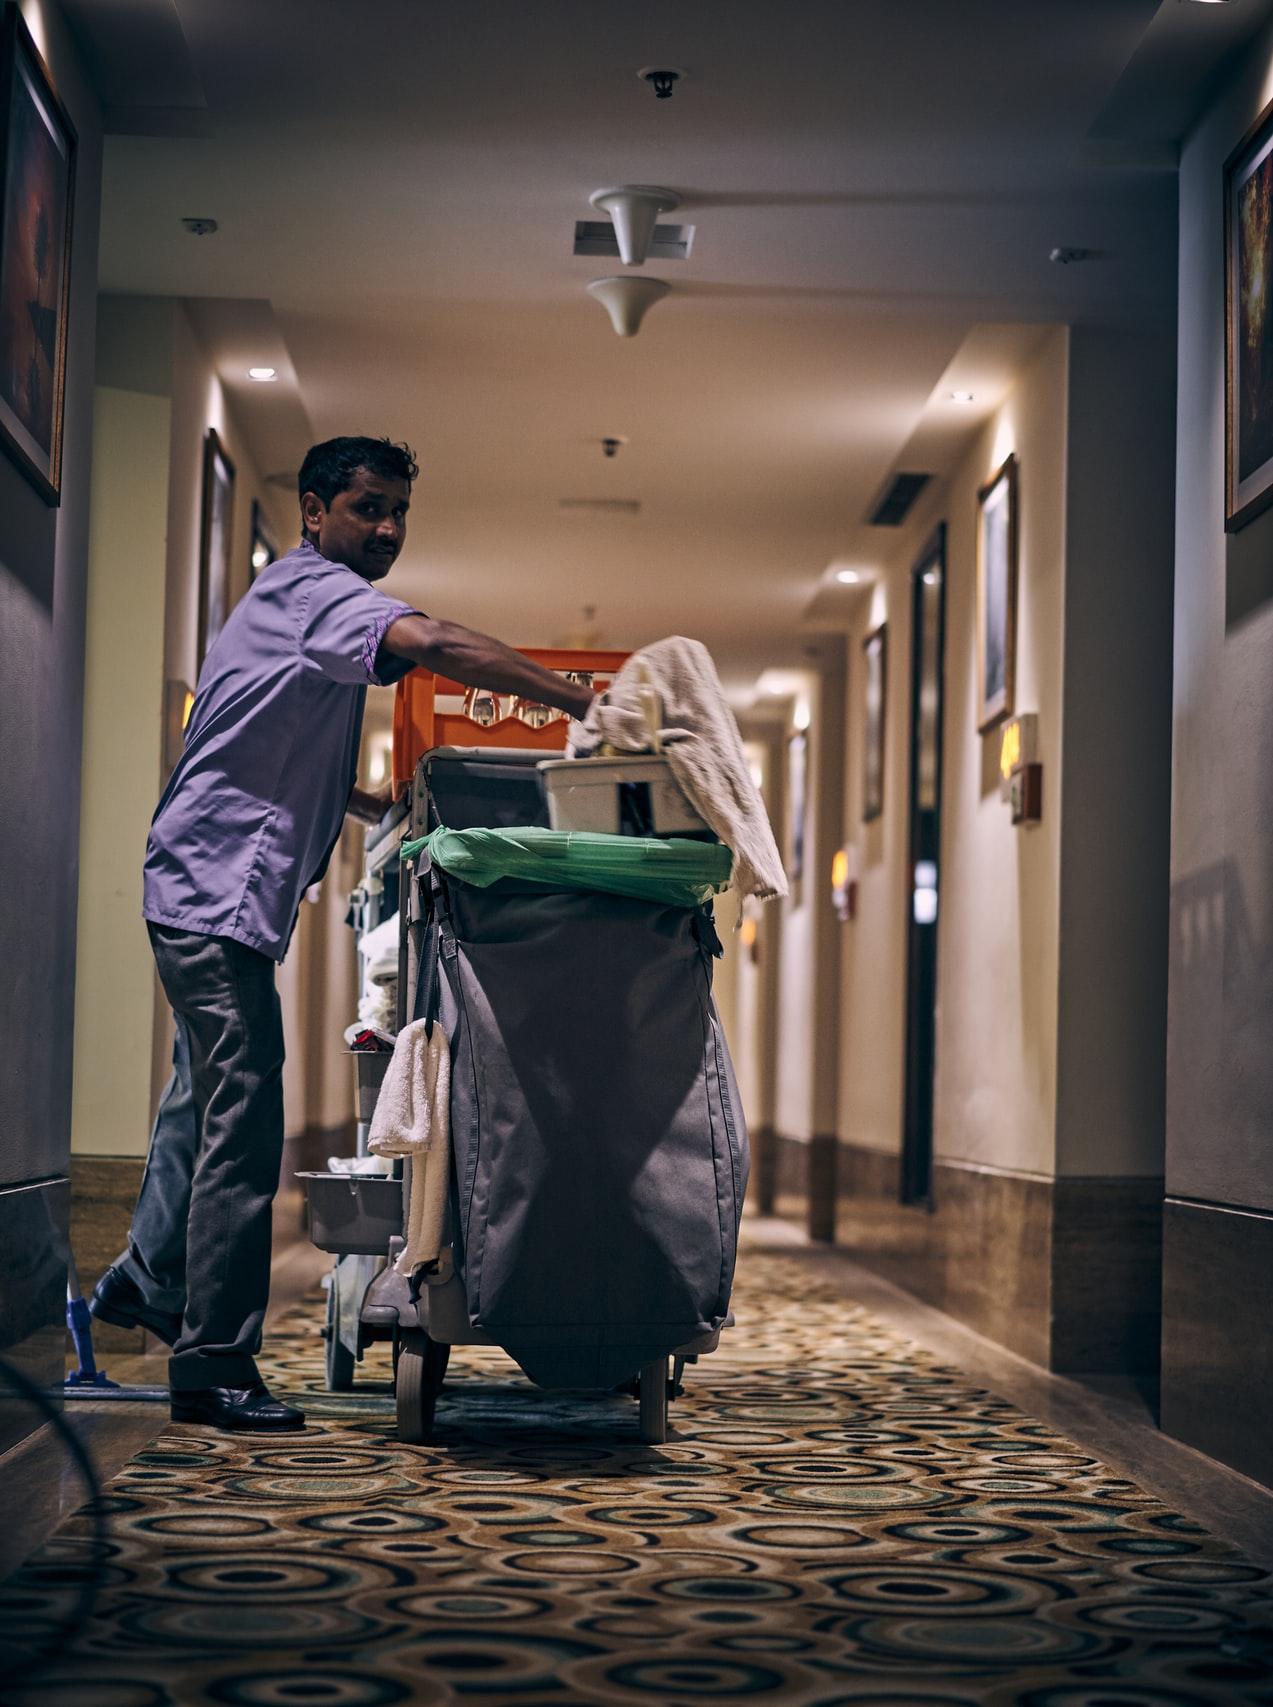 The 9 Best Floor Cleaners To Buy in 2020